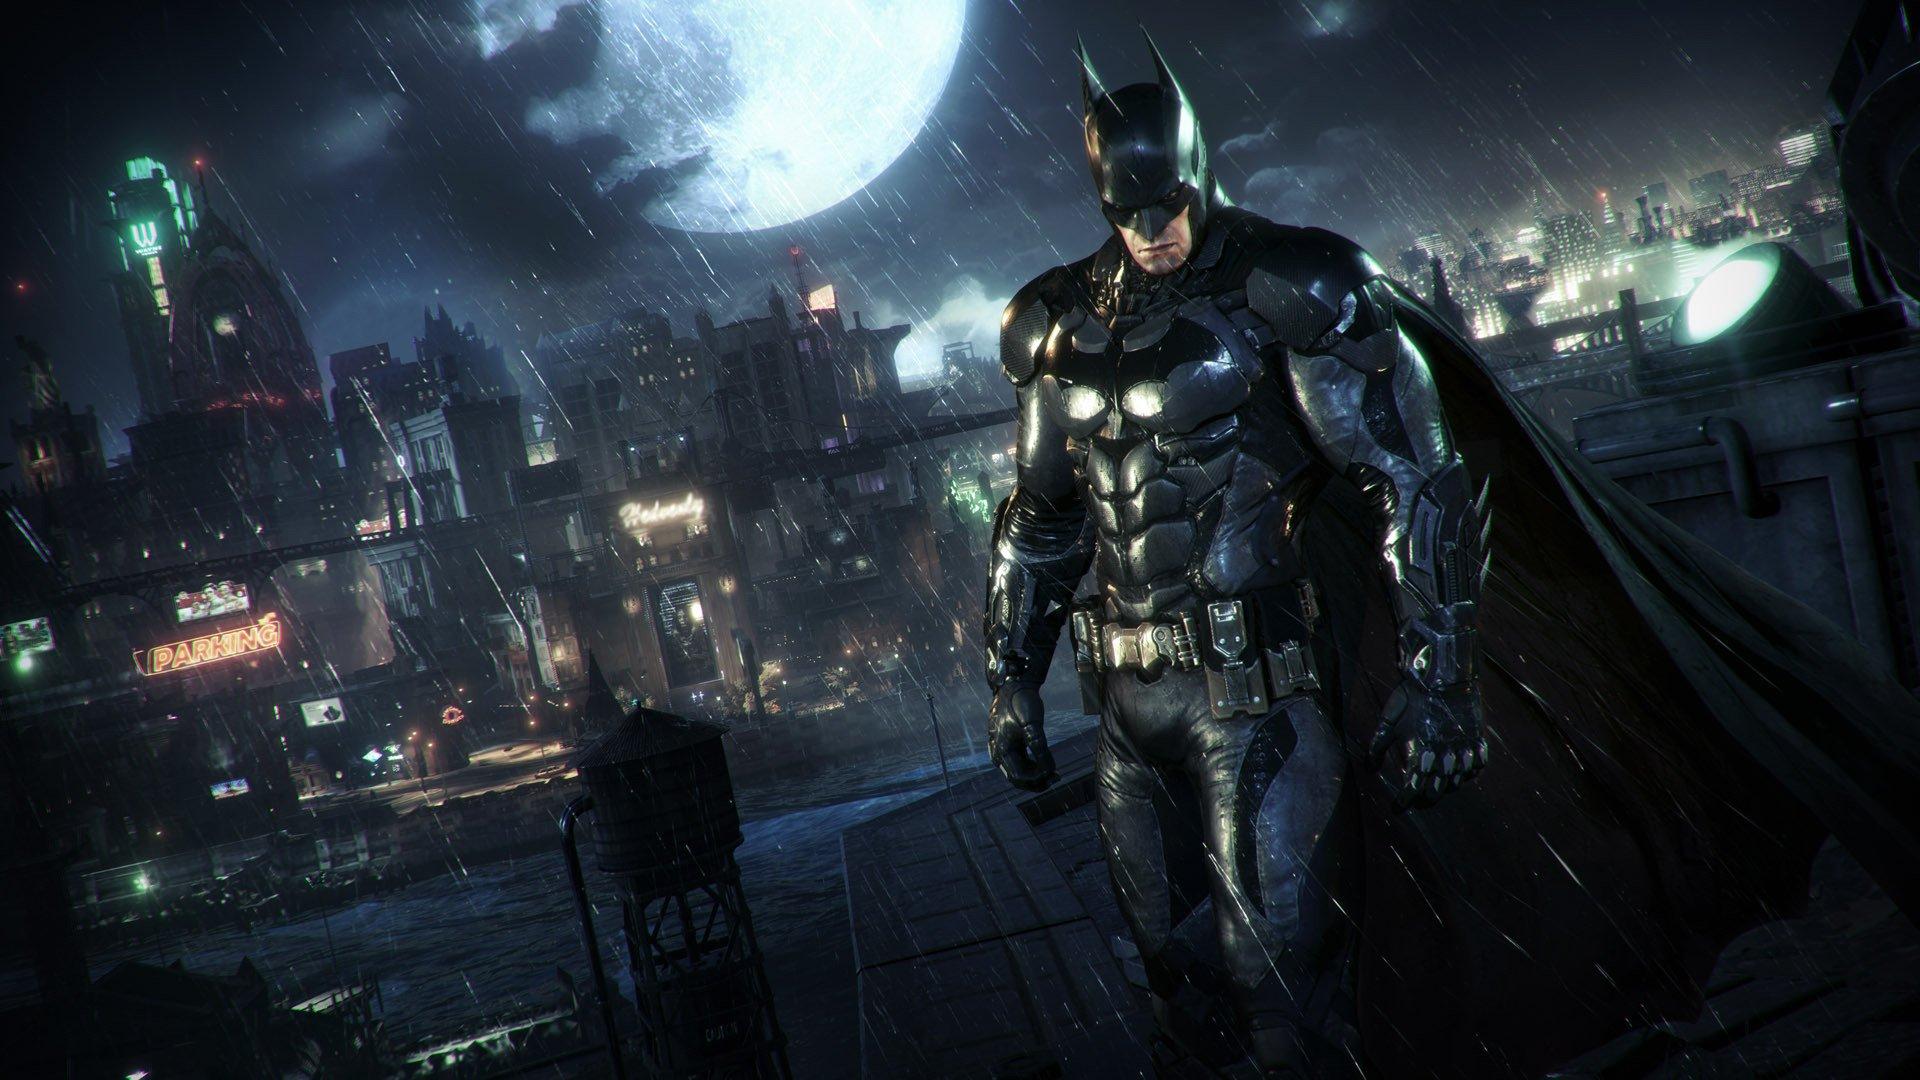 http://i11c.3djuegos.com/juegos/10762/batman_arkham_knight/fotos/set/batman_arkham_knight-2555523.jpg